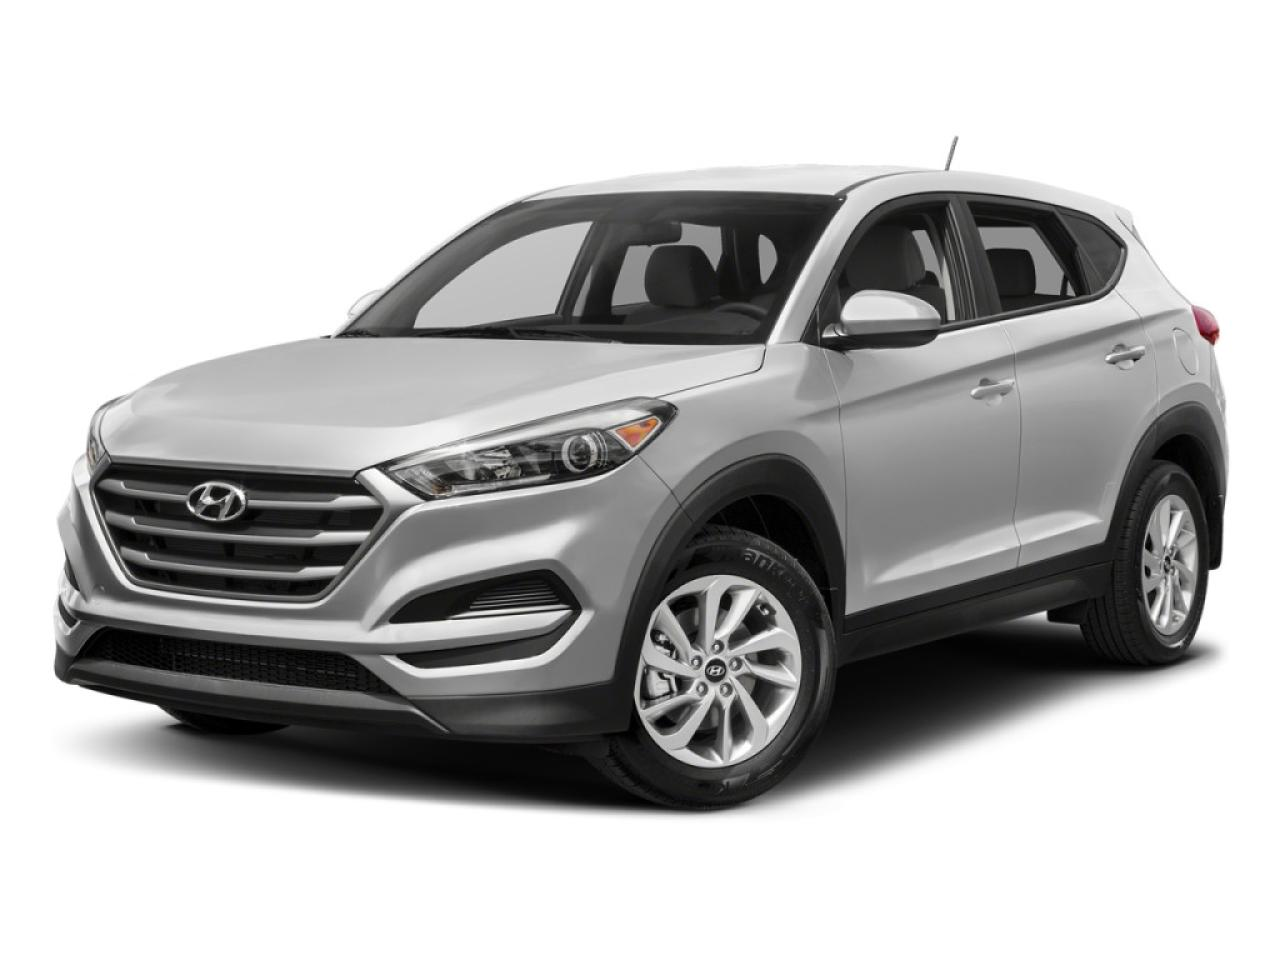 2018 Hyundai Tucson 1.6T AWD Noir NO OPTIONS